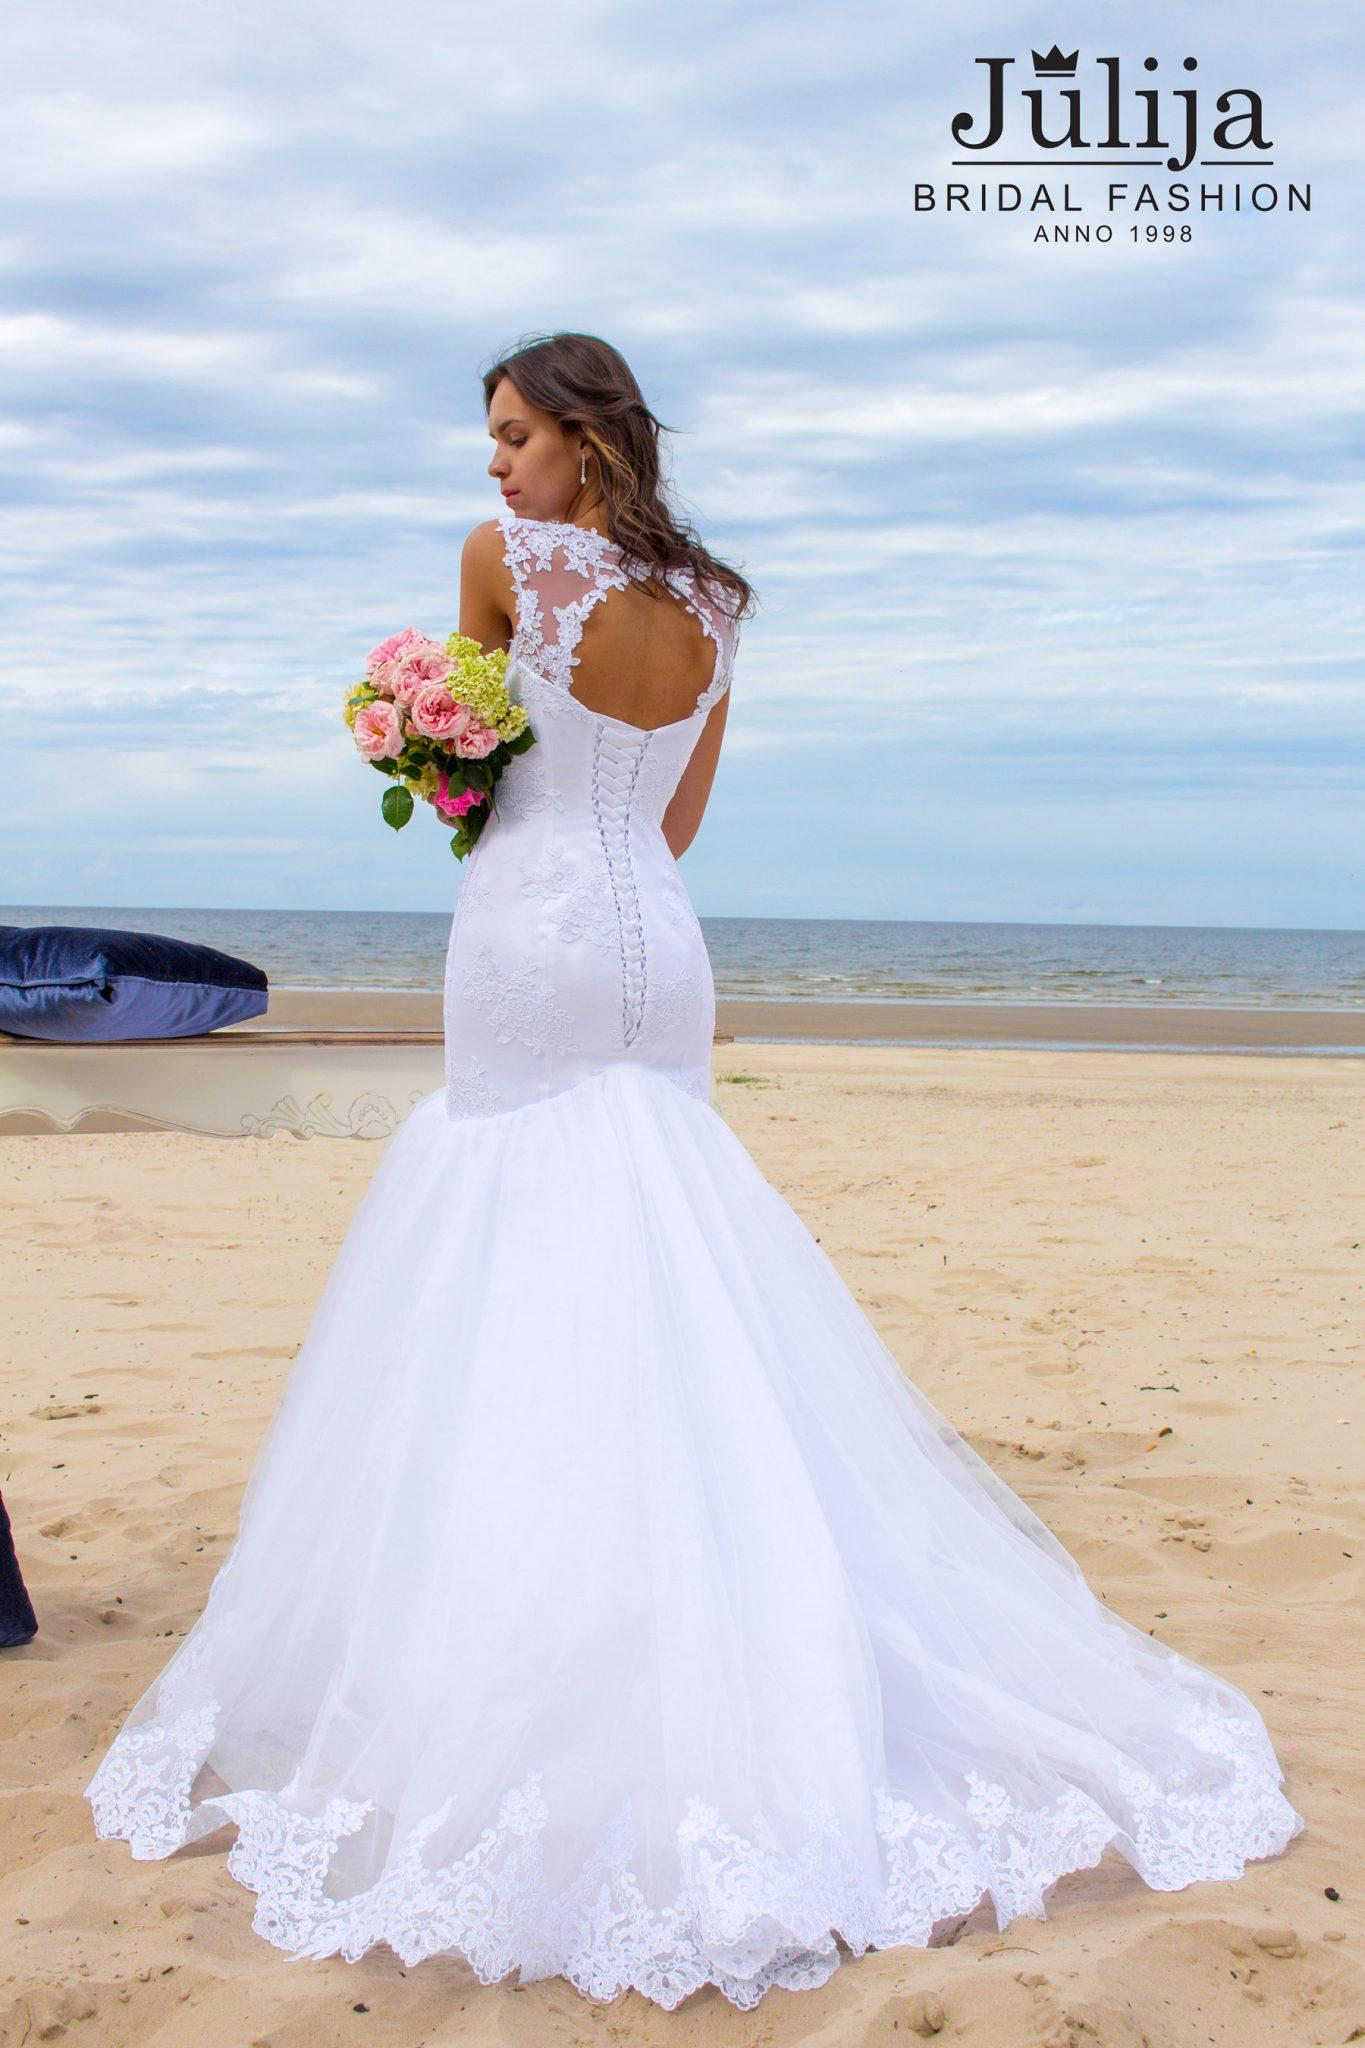 Enrica | Wholesale wedding dresses - Julija Bridal Fashion